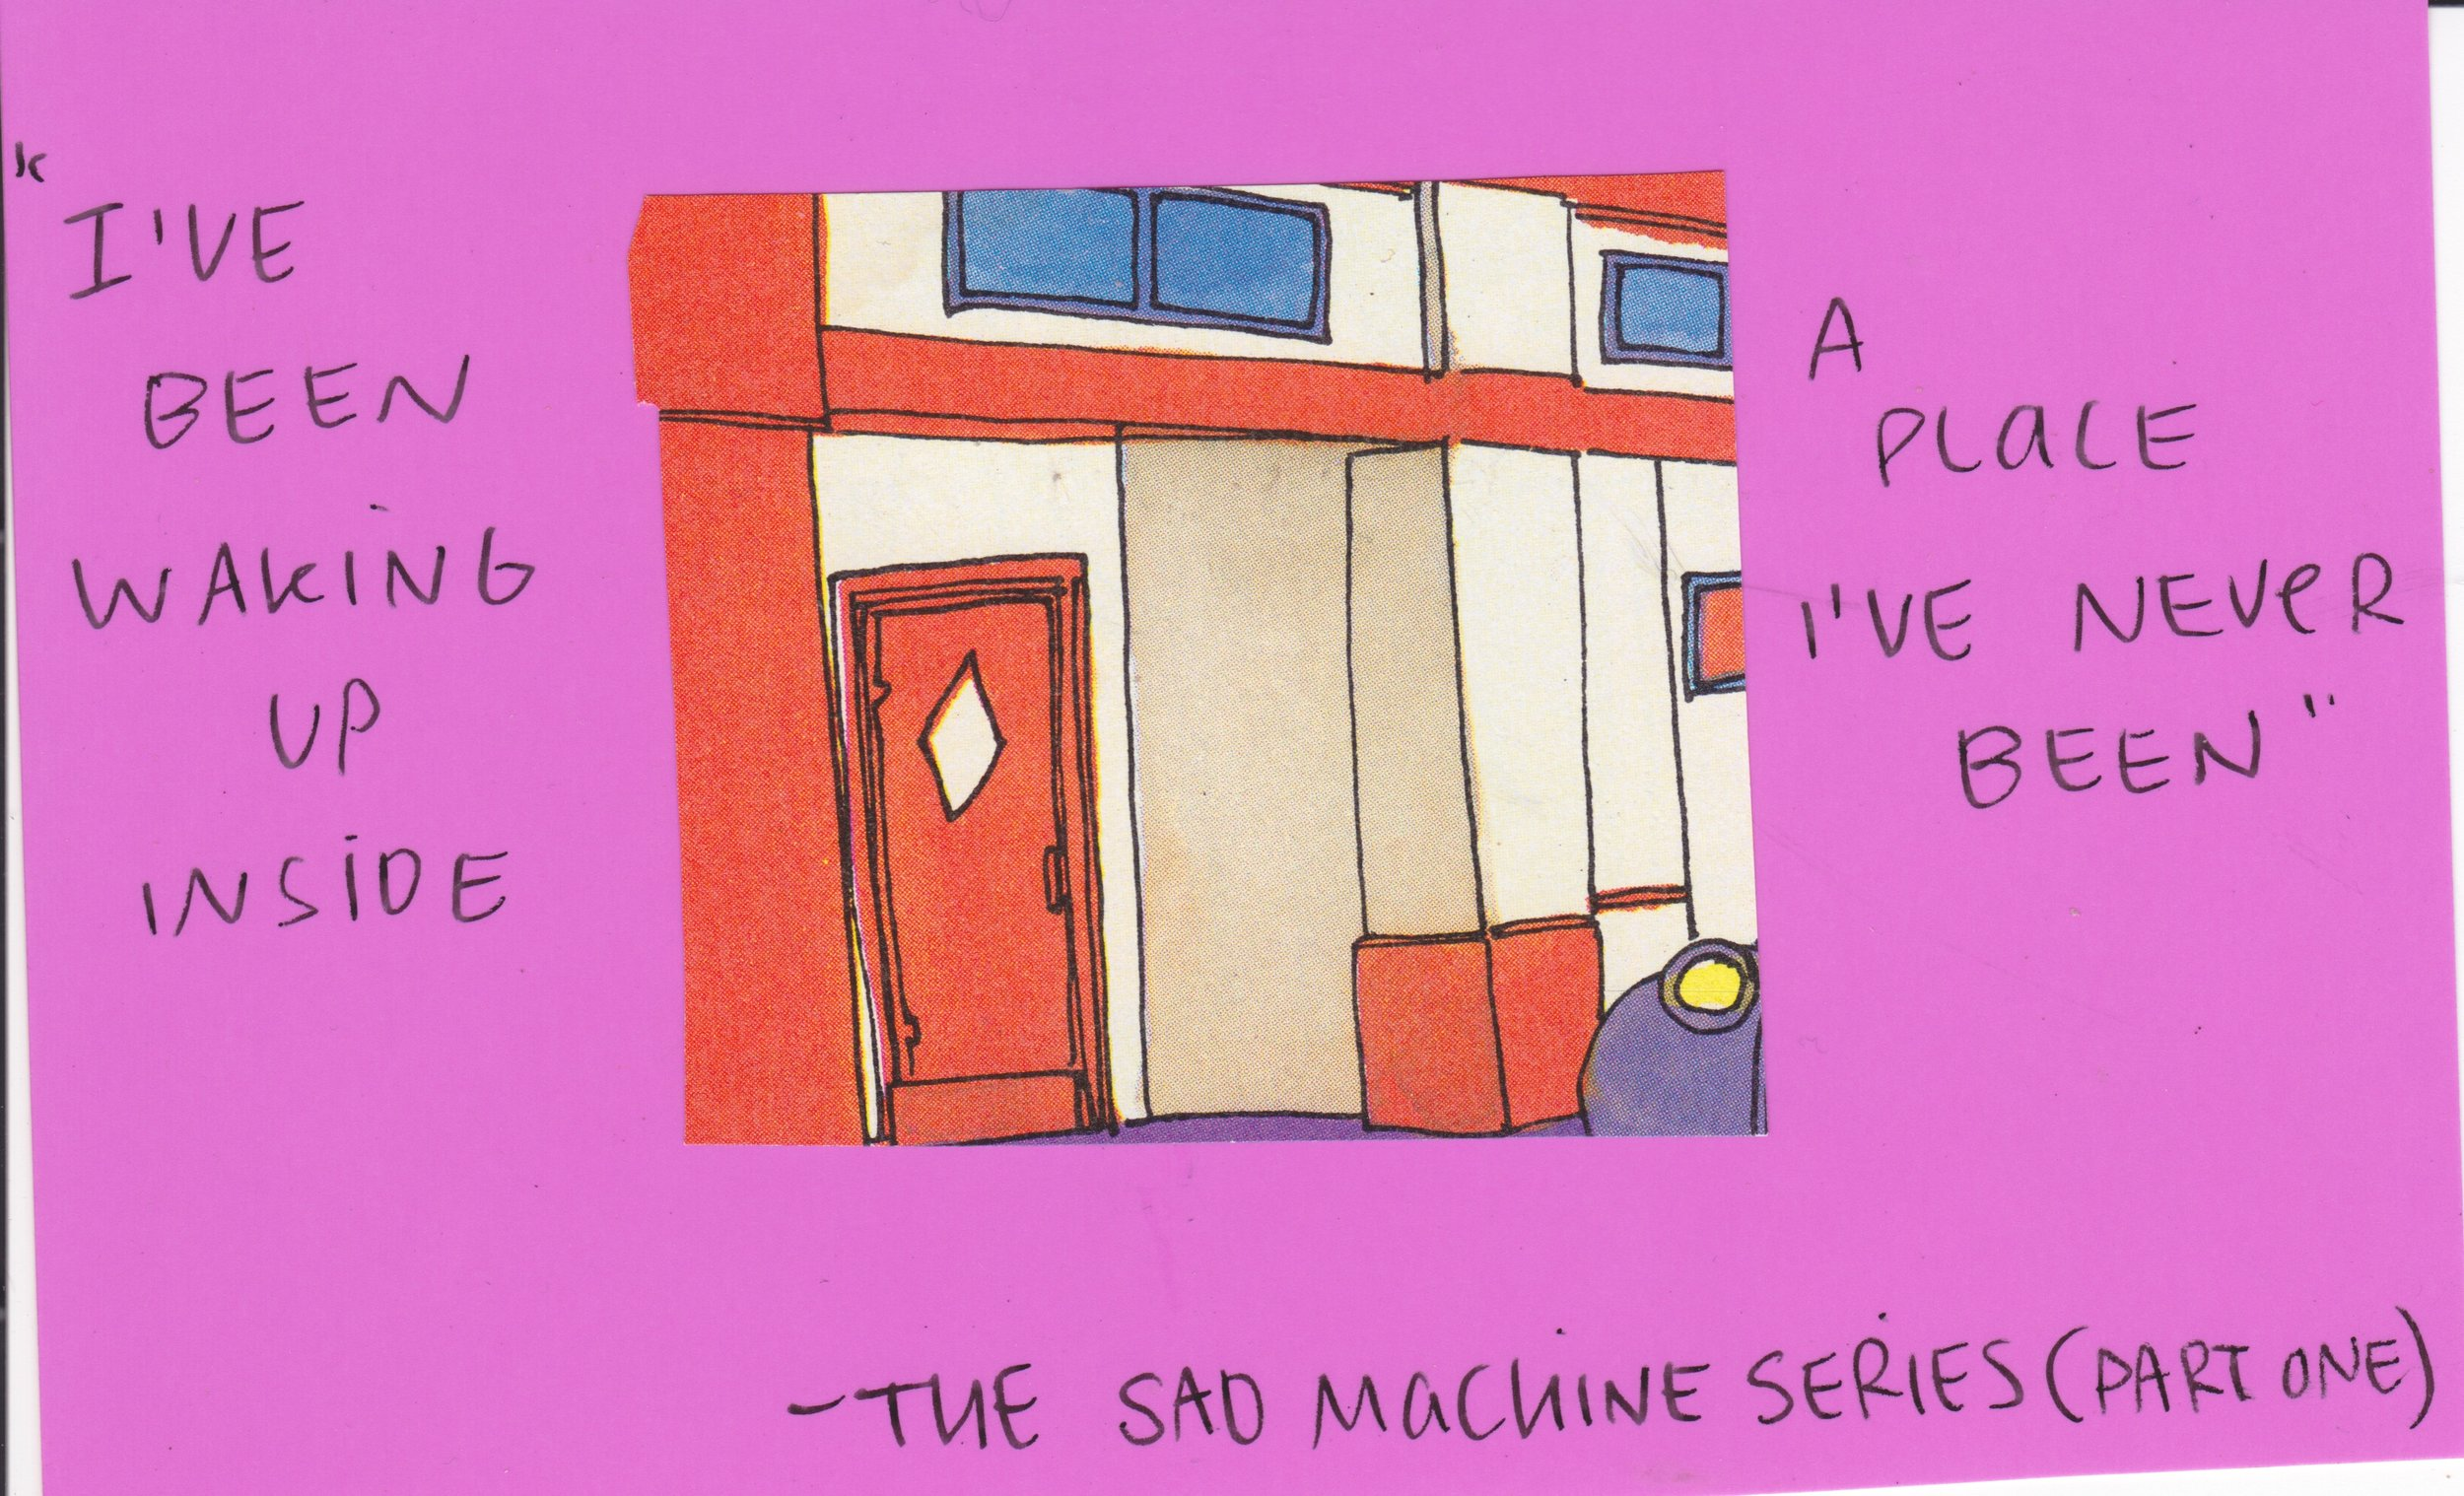 Sad Machine Series Quotes 9.jpeg